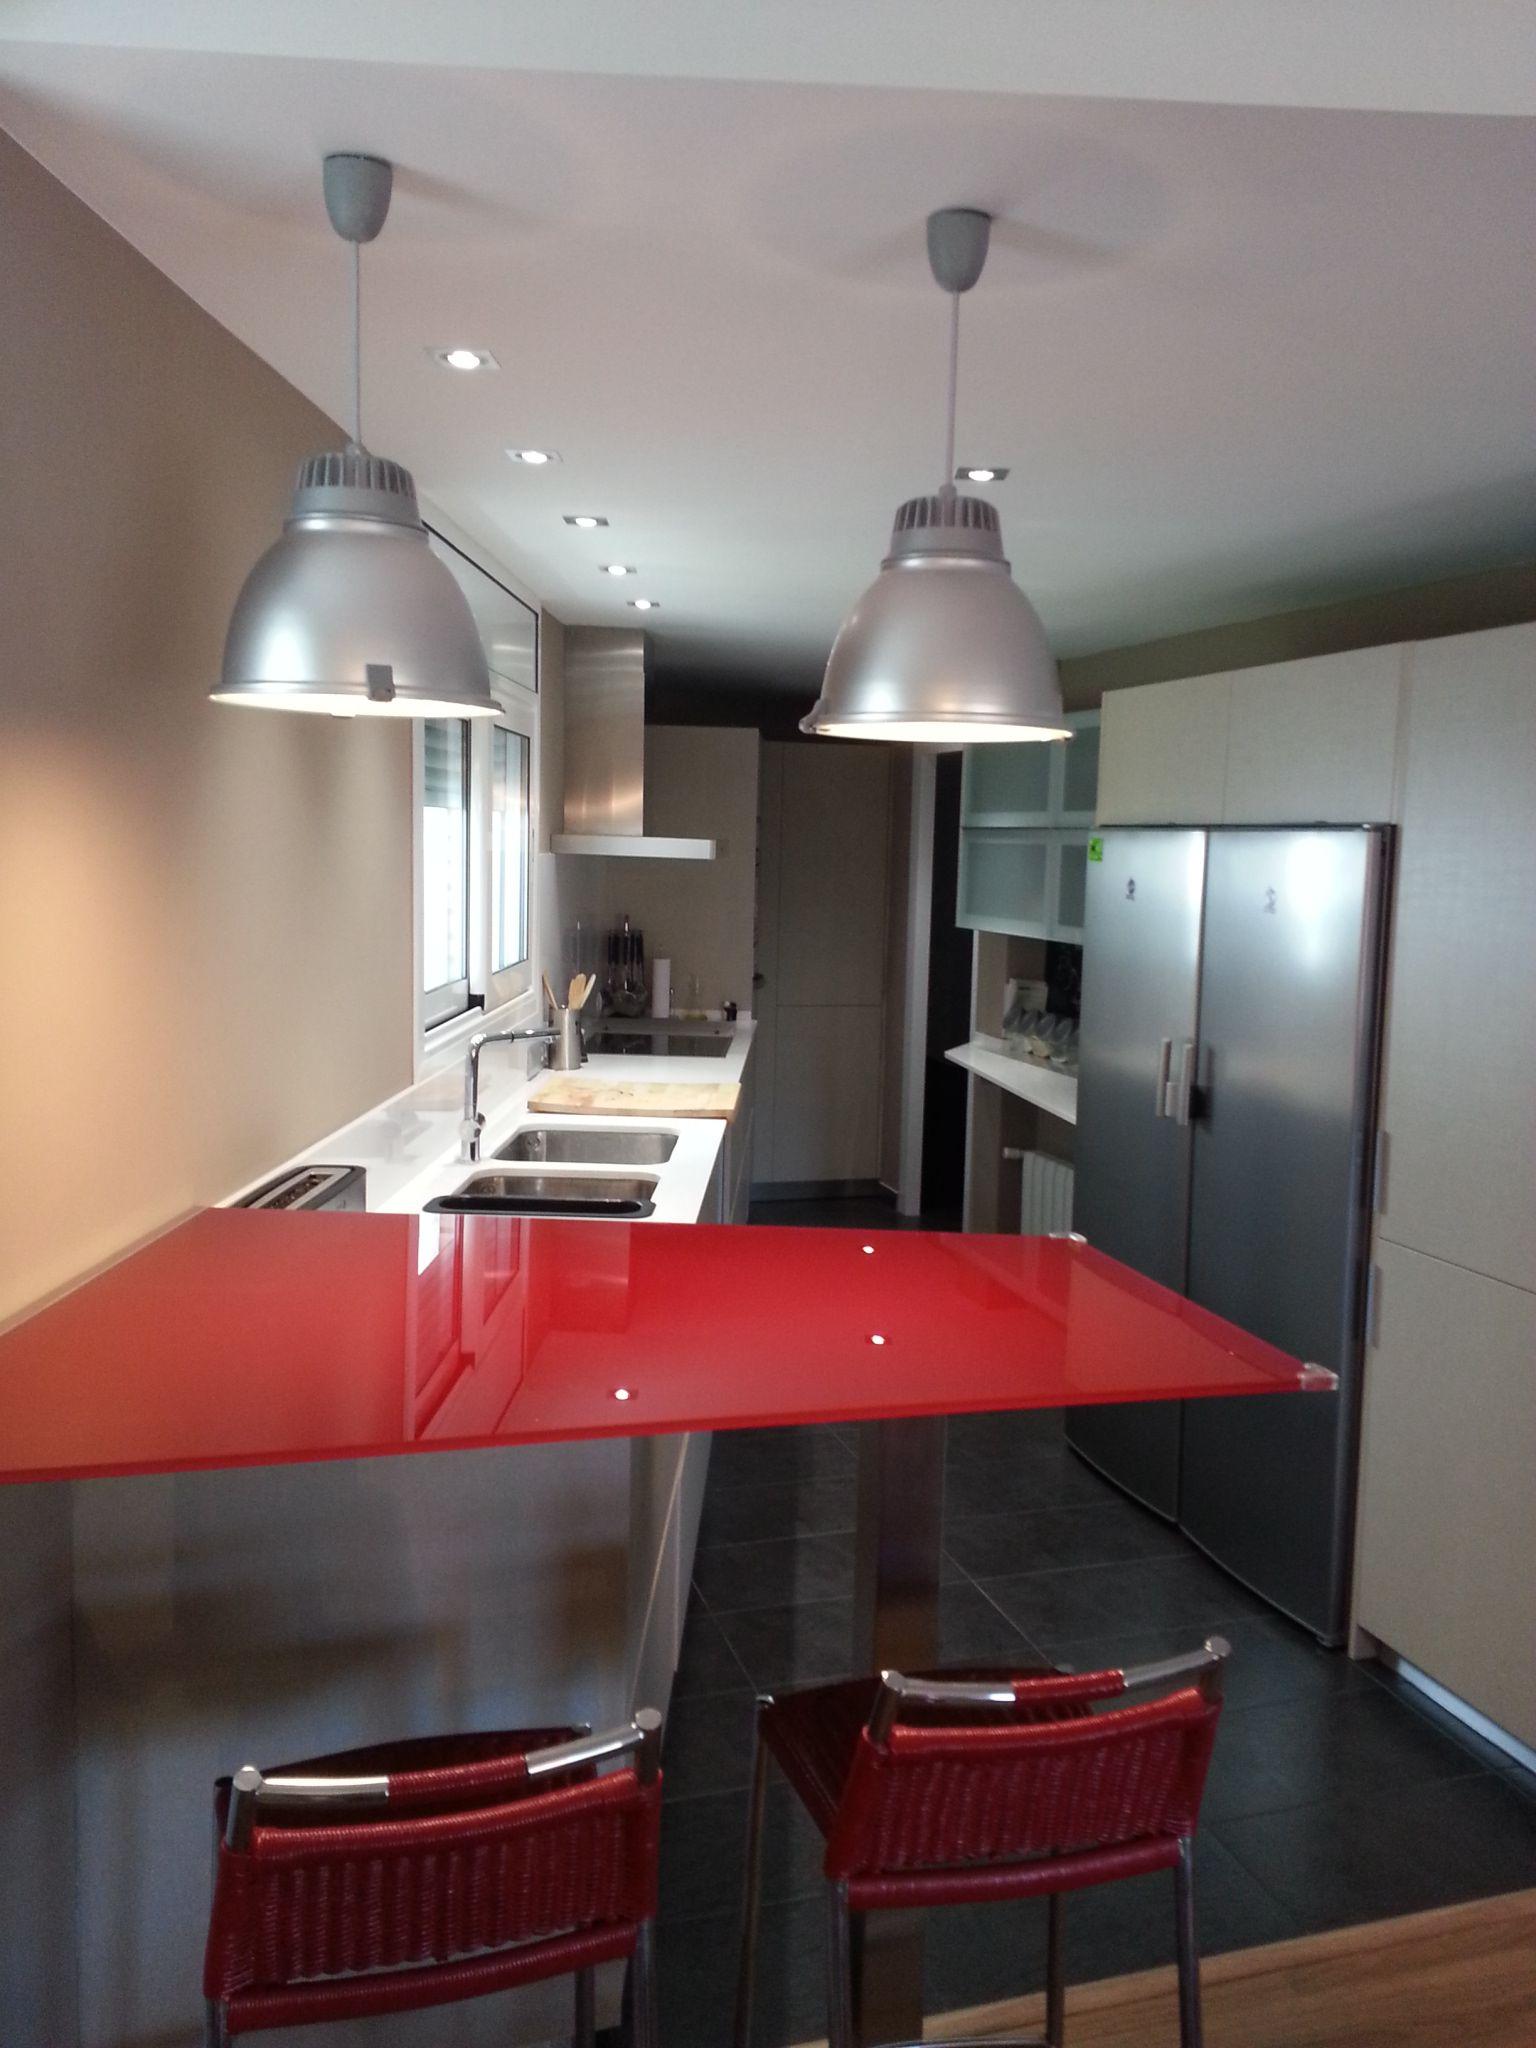 Decoracion moderno cocina encimeras barras de cocina - Barras para cocinas ...